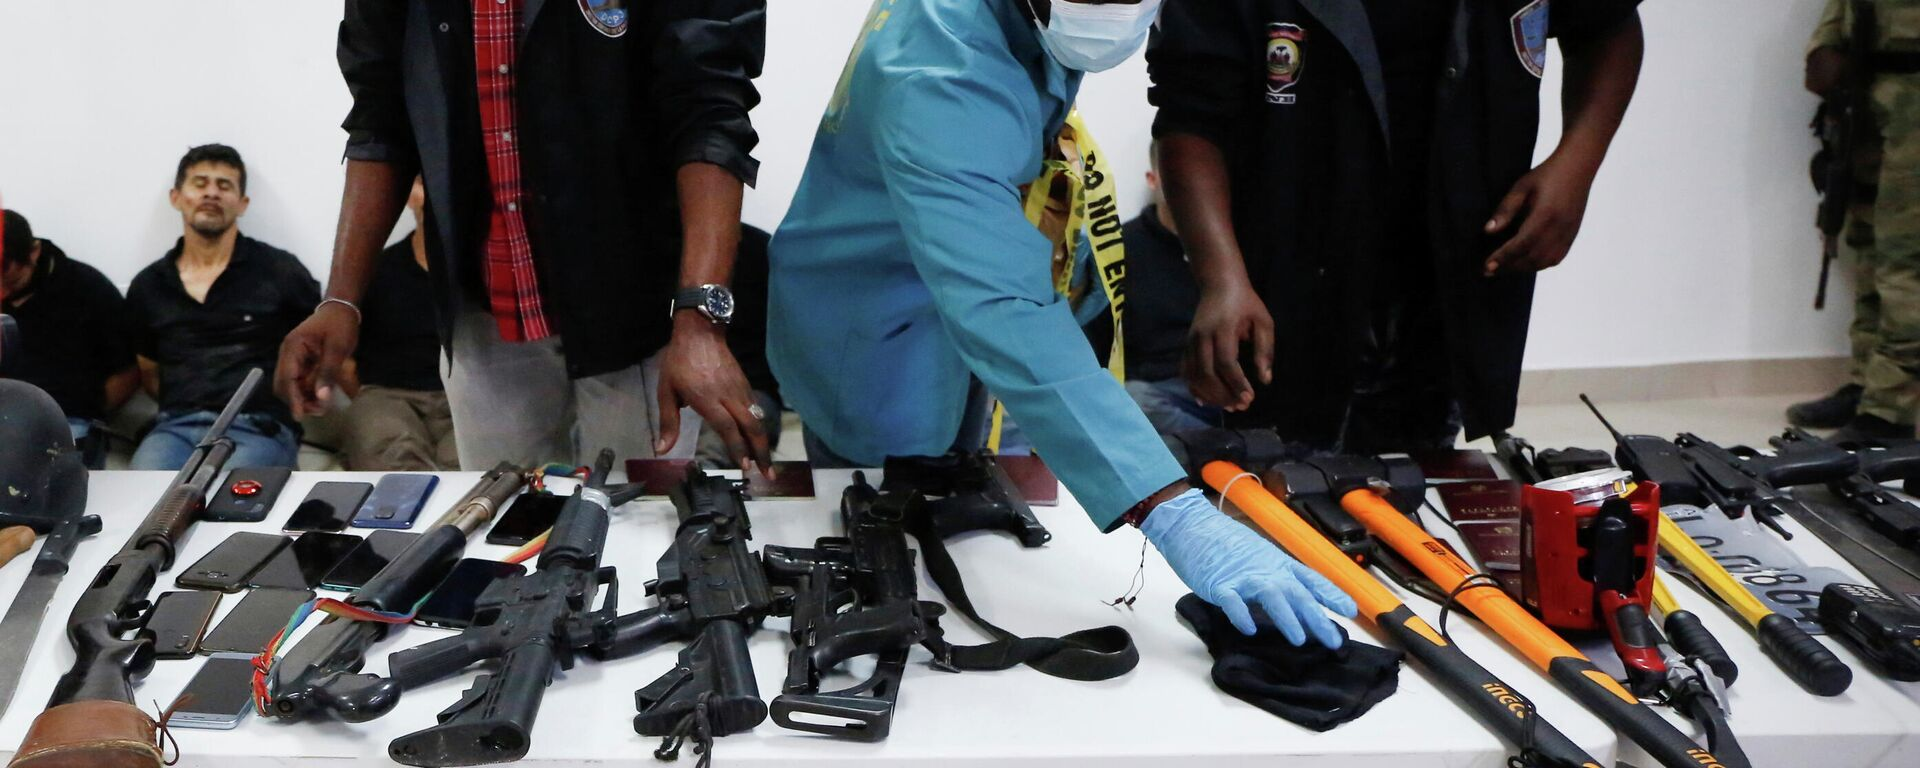 Armas del comando que asesinó al presidente de Haití - Sputnik Mundo, 1920, 09.07.2021